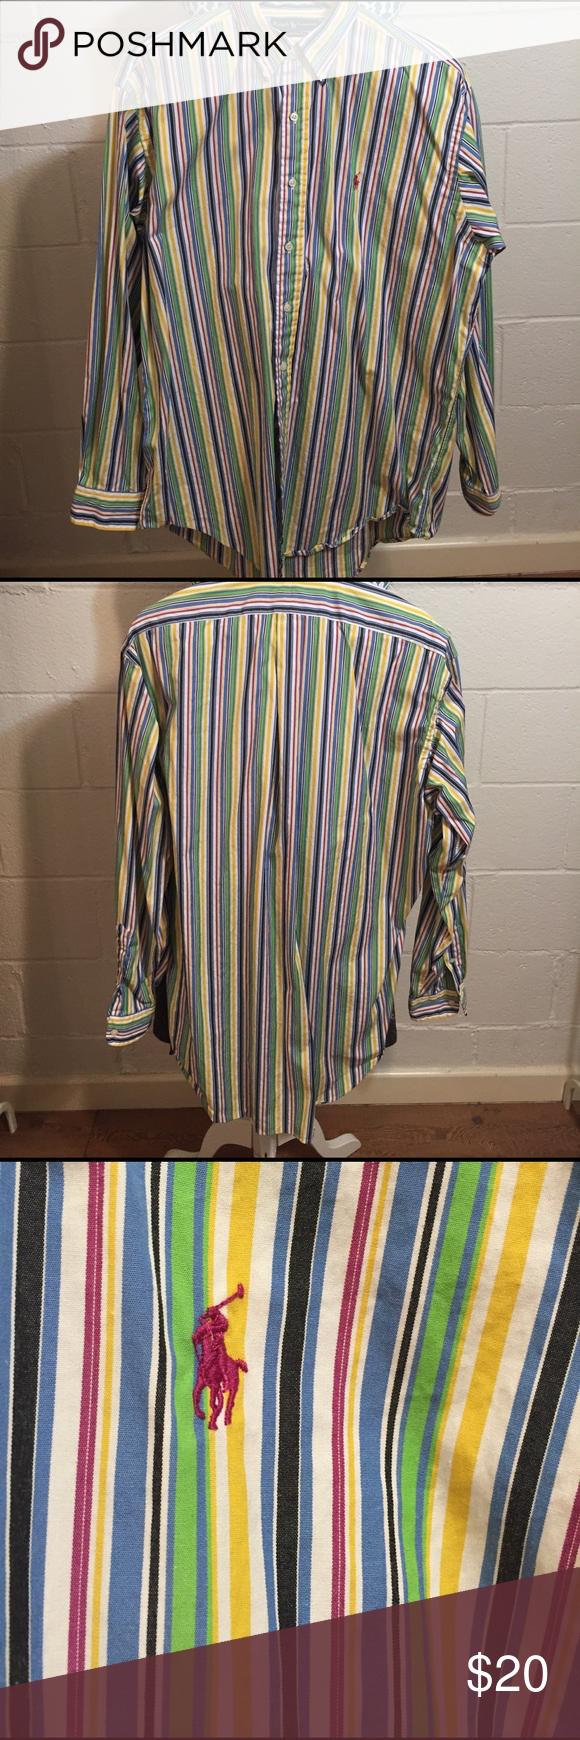 RL Multi Striped Button Down Shirt Thin stripes of green, purple, blue, white, yellow & black. 100% cotton. EUC Ralph Lauren Shirts Dress Shirts